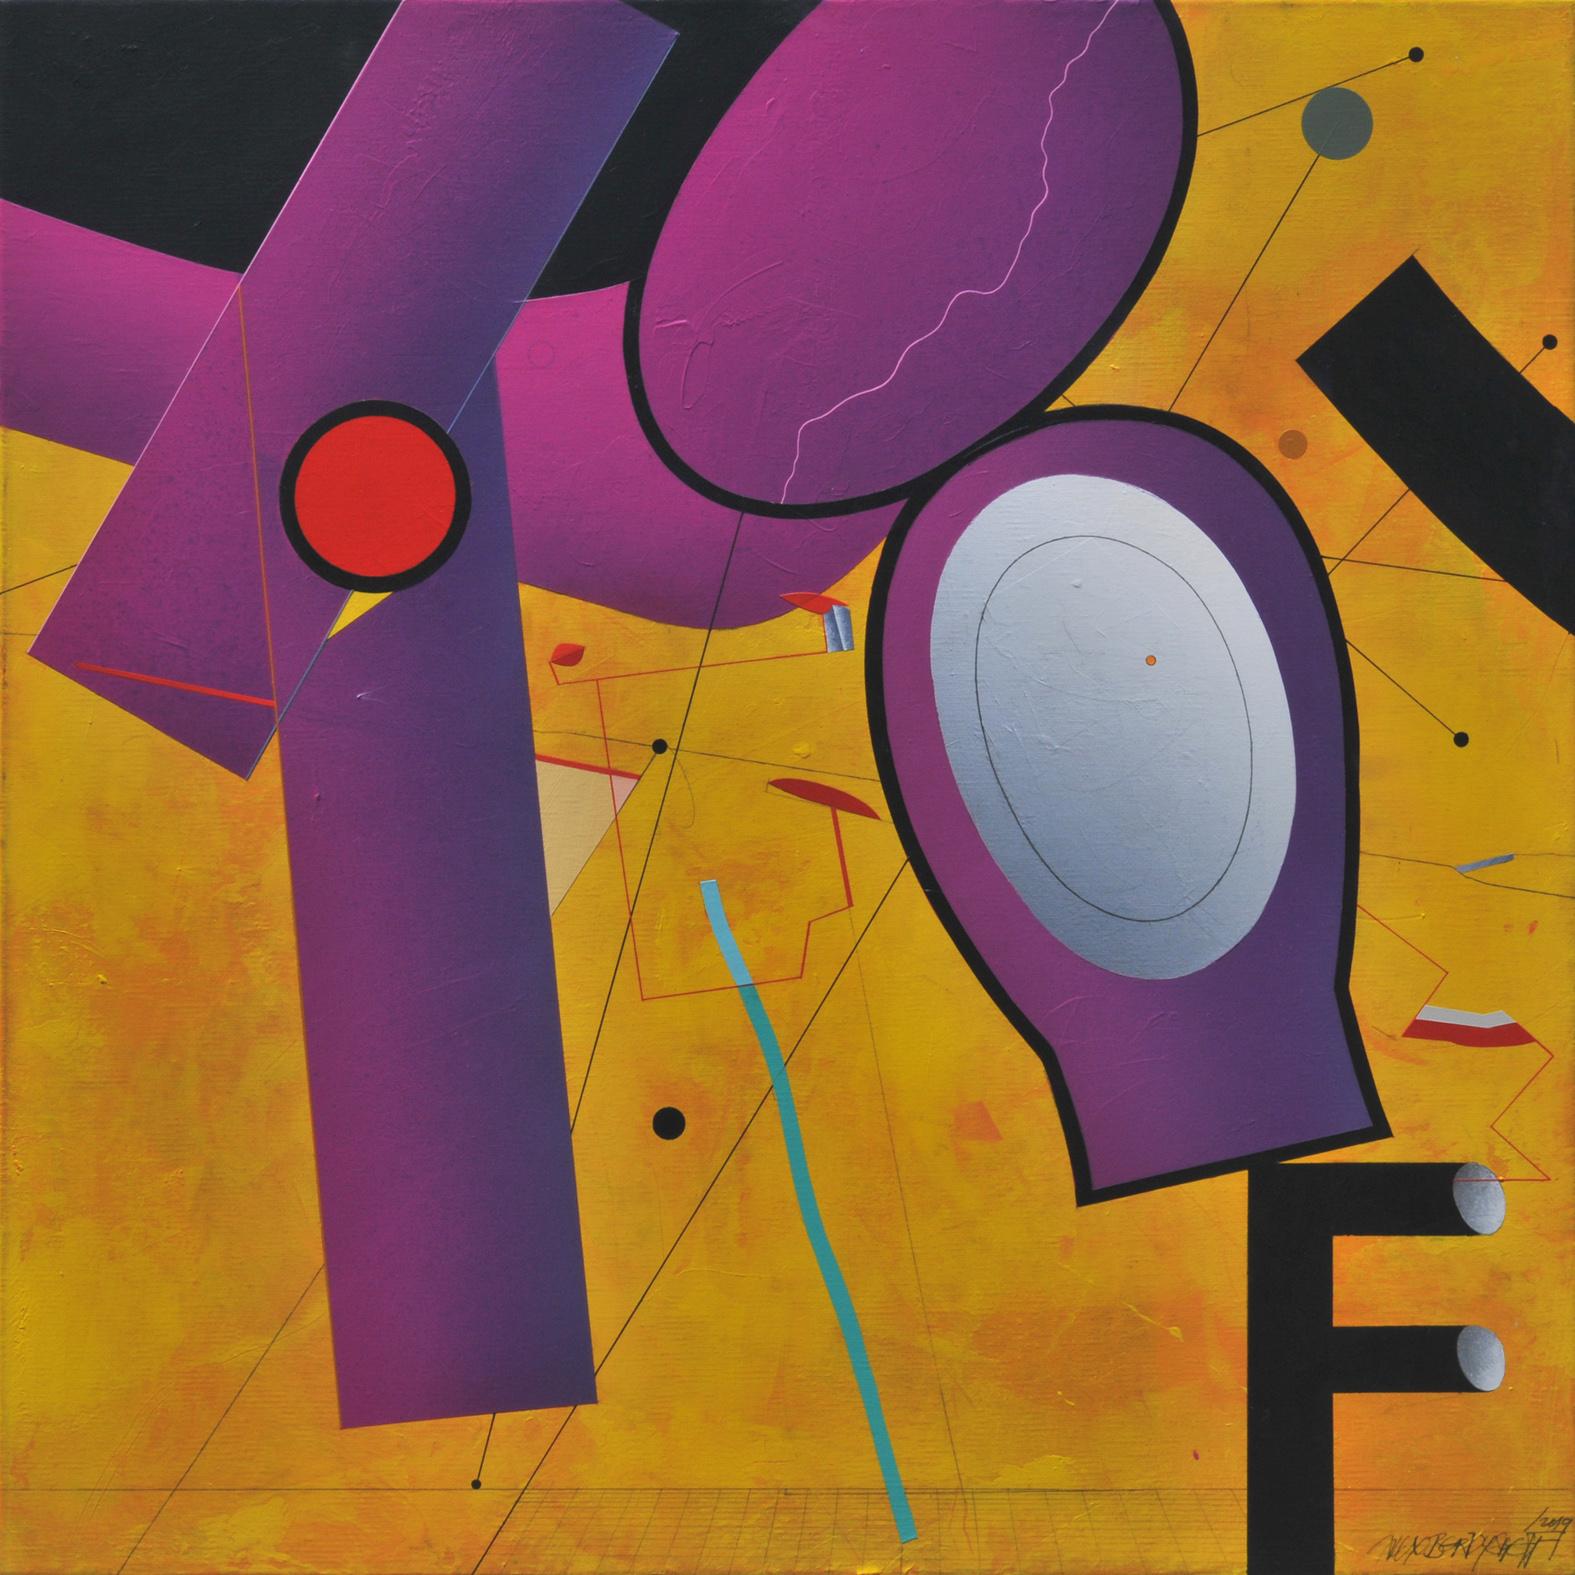 Attraction, acrylic on canvas, 85x85 cm, 2019